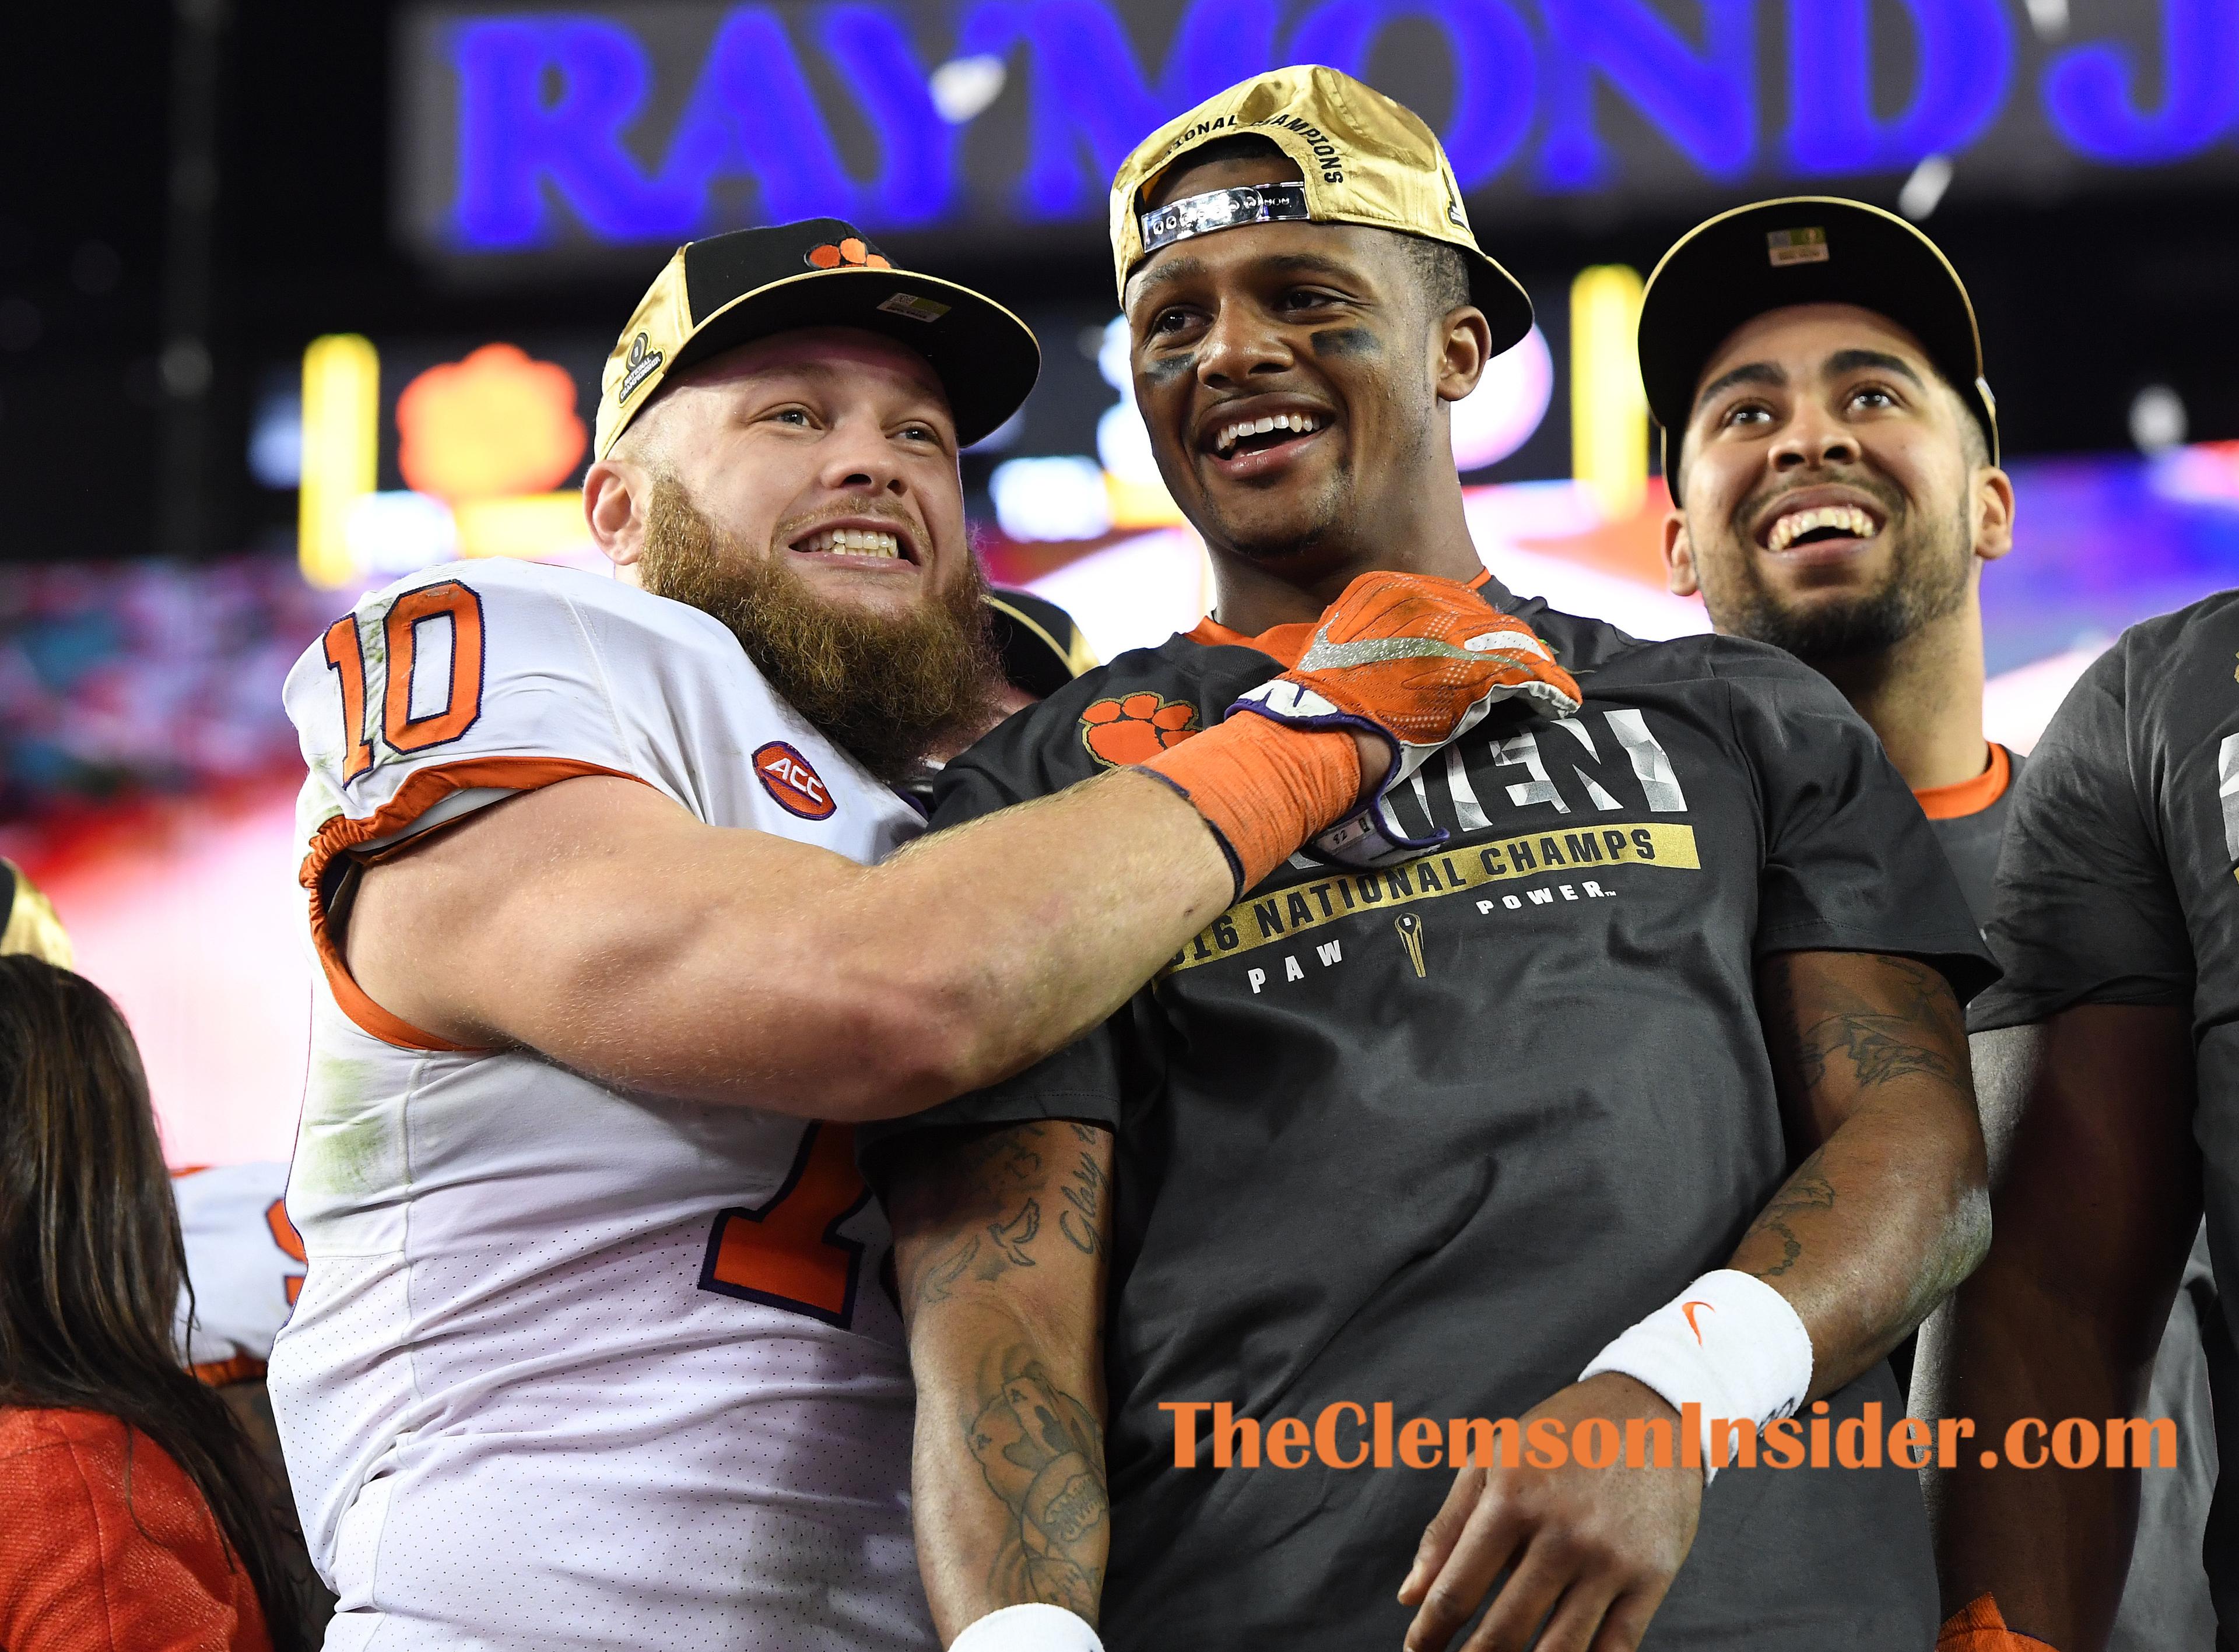 Clemson linebacker Ben Boulware (10) hugs quarterback Deshaun Watson (4) after the Tigers defeated Alabama 35-31 to win the National Championship at Raymond James Stadium in Tampa on Monday, January 9, 2017.